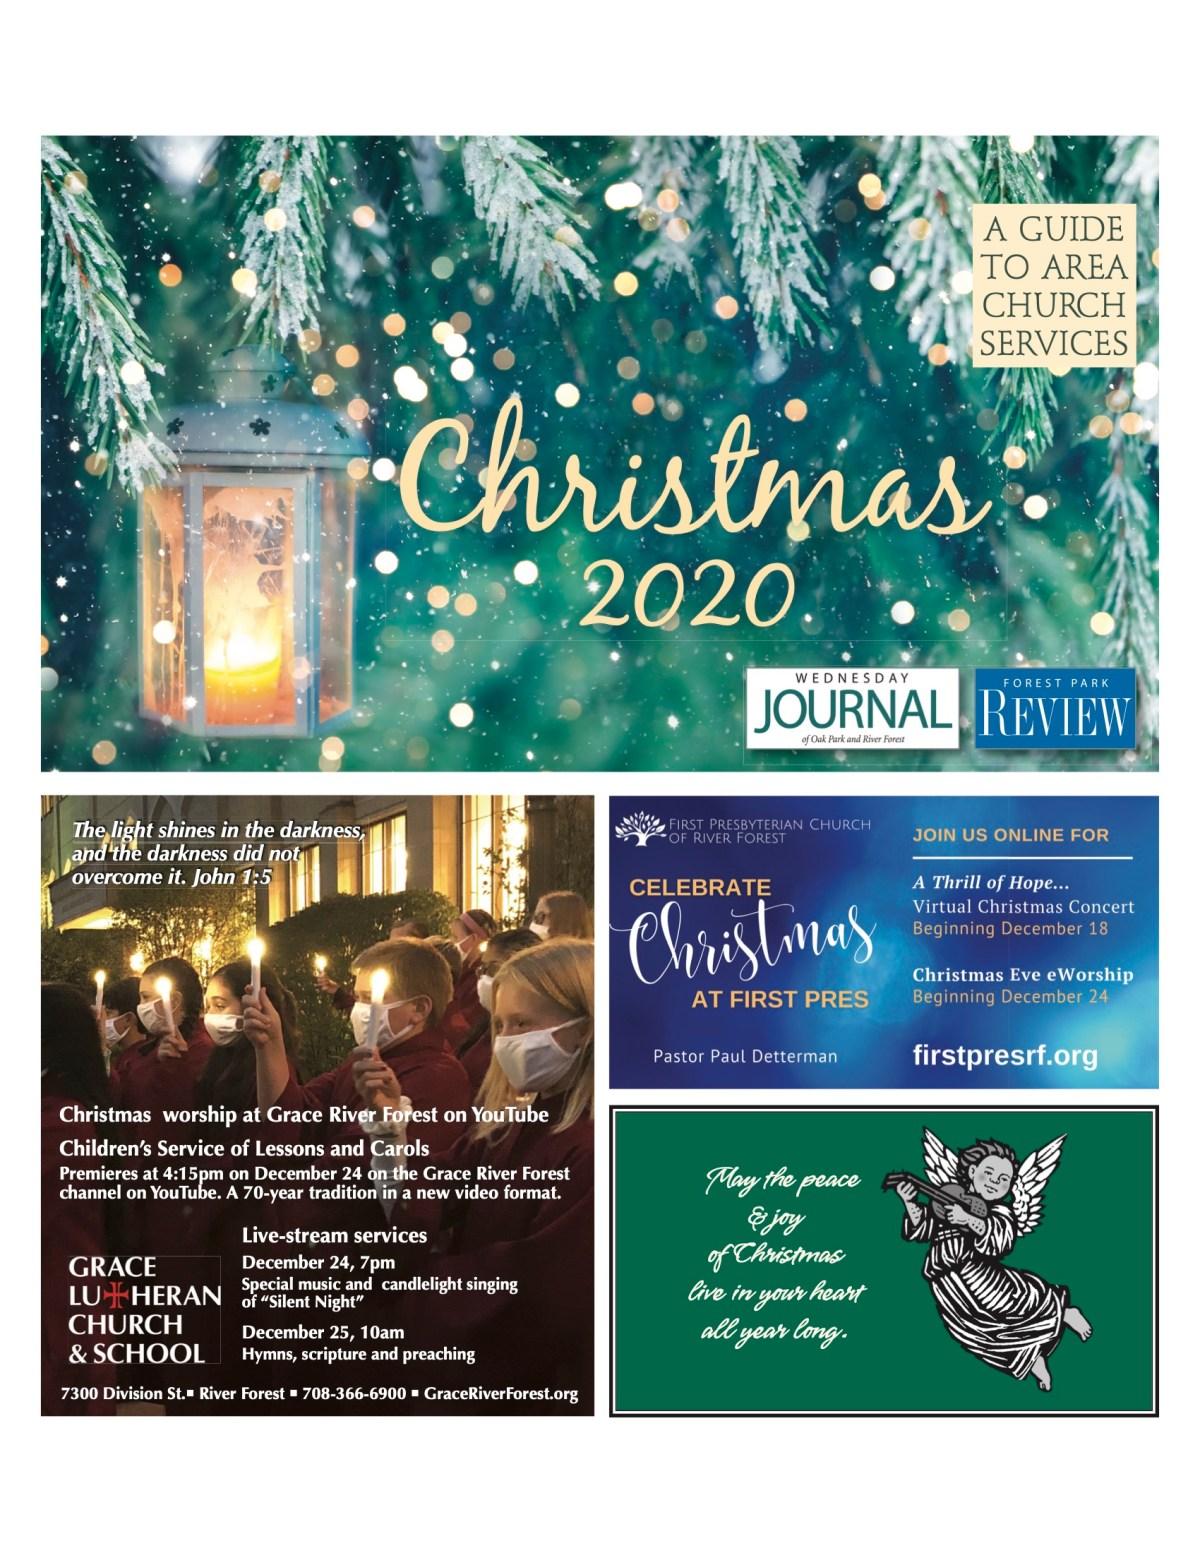 Christmas Church Services Near Me 2021 2020 Christmas Church Guide I Oak Park